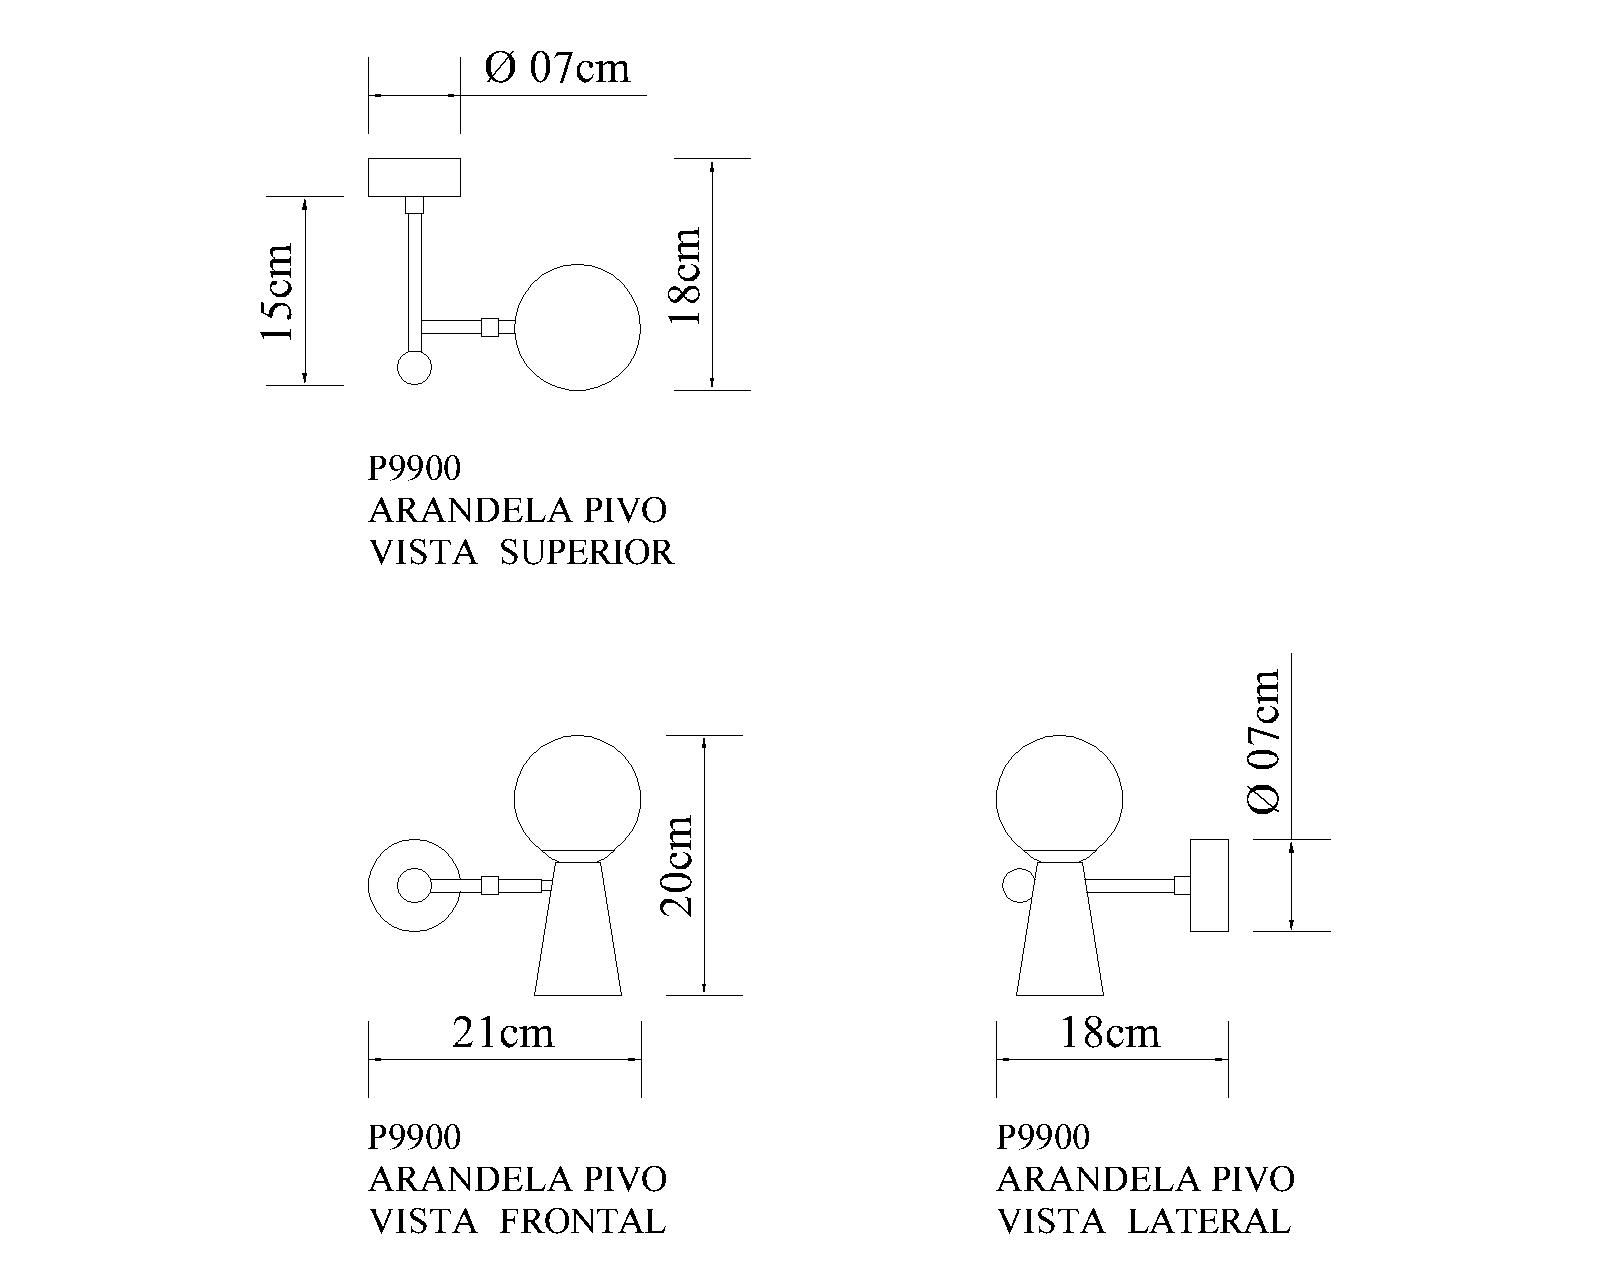 Arandela Pivô 2 Focos de Luz Regulável Golden Art P9900